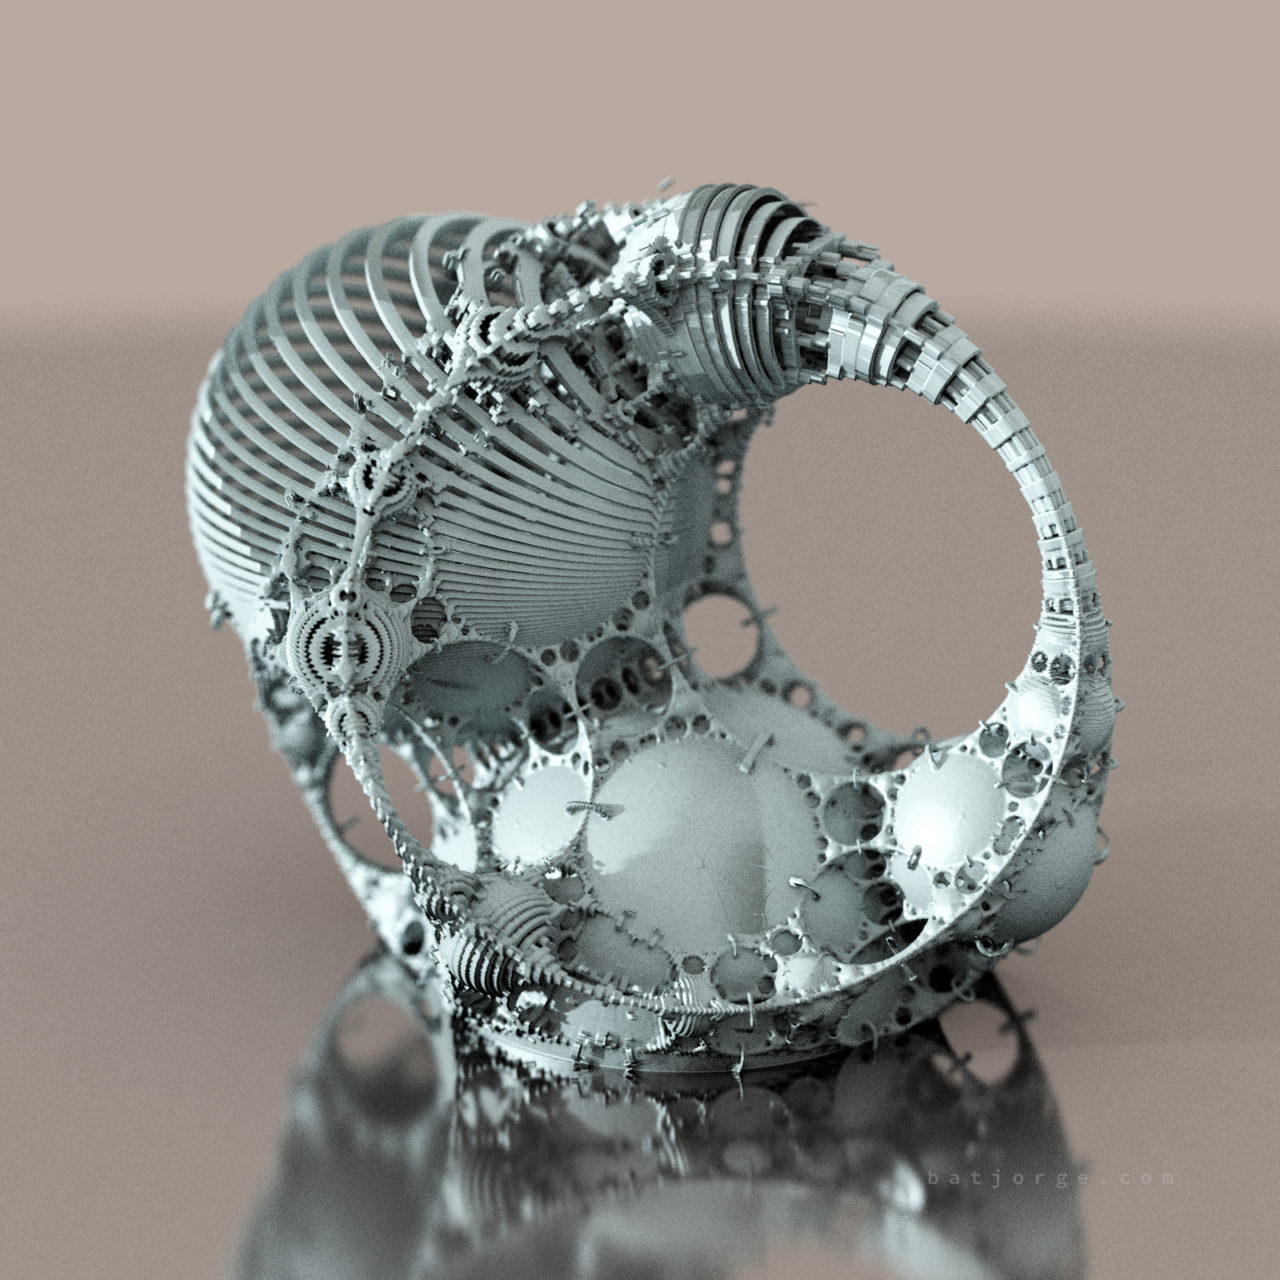 3D fractal orb. mandelbulber pseudokleinian blockified